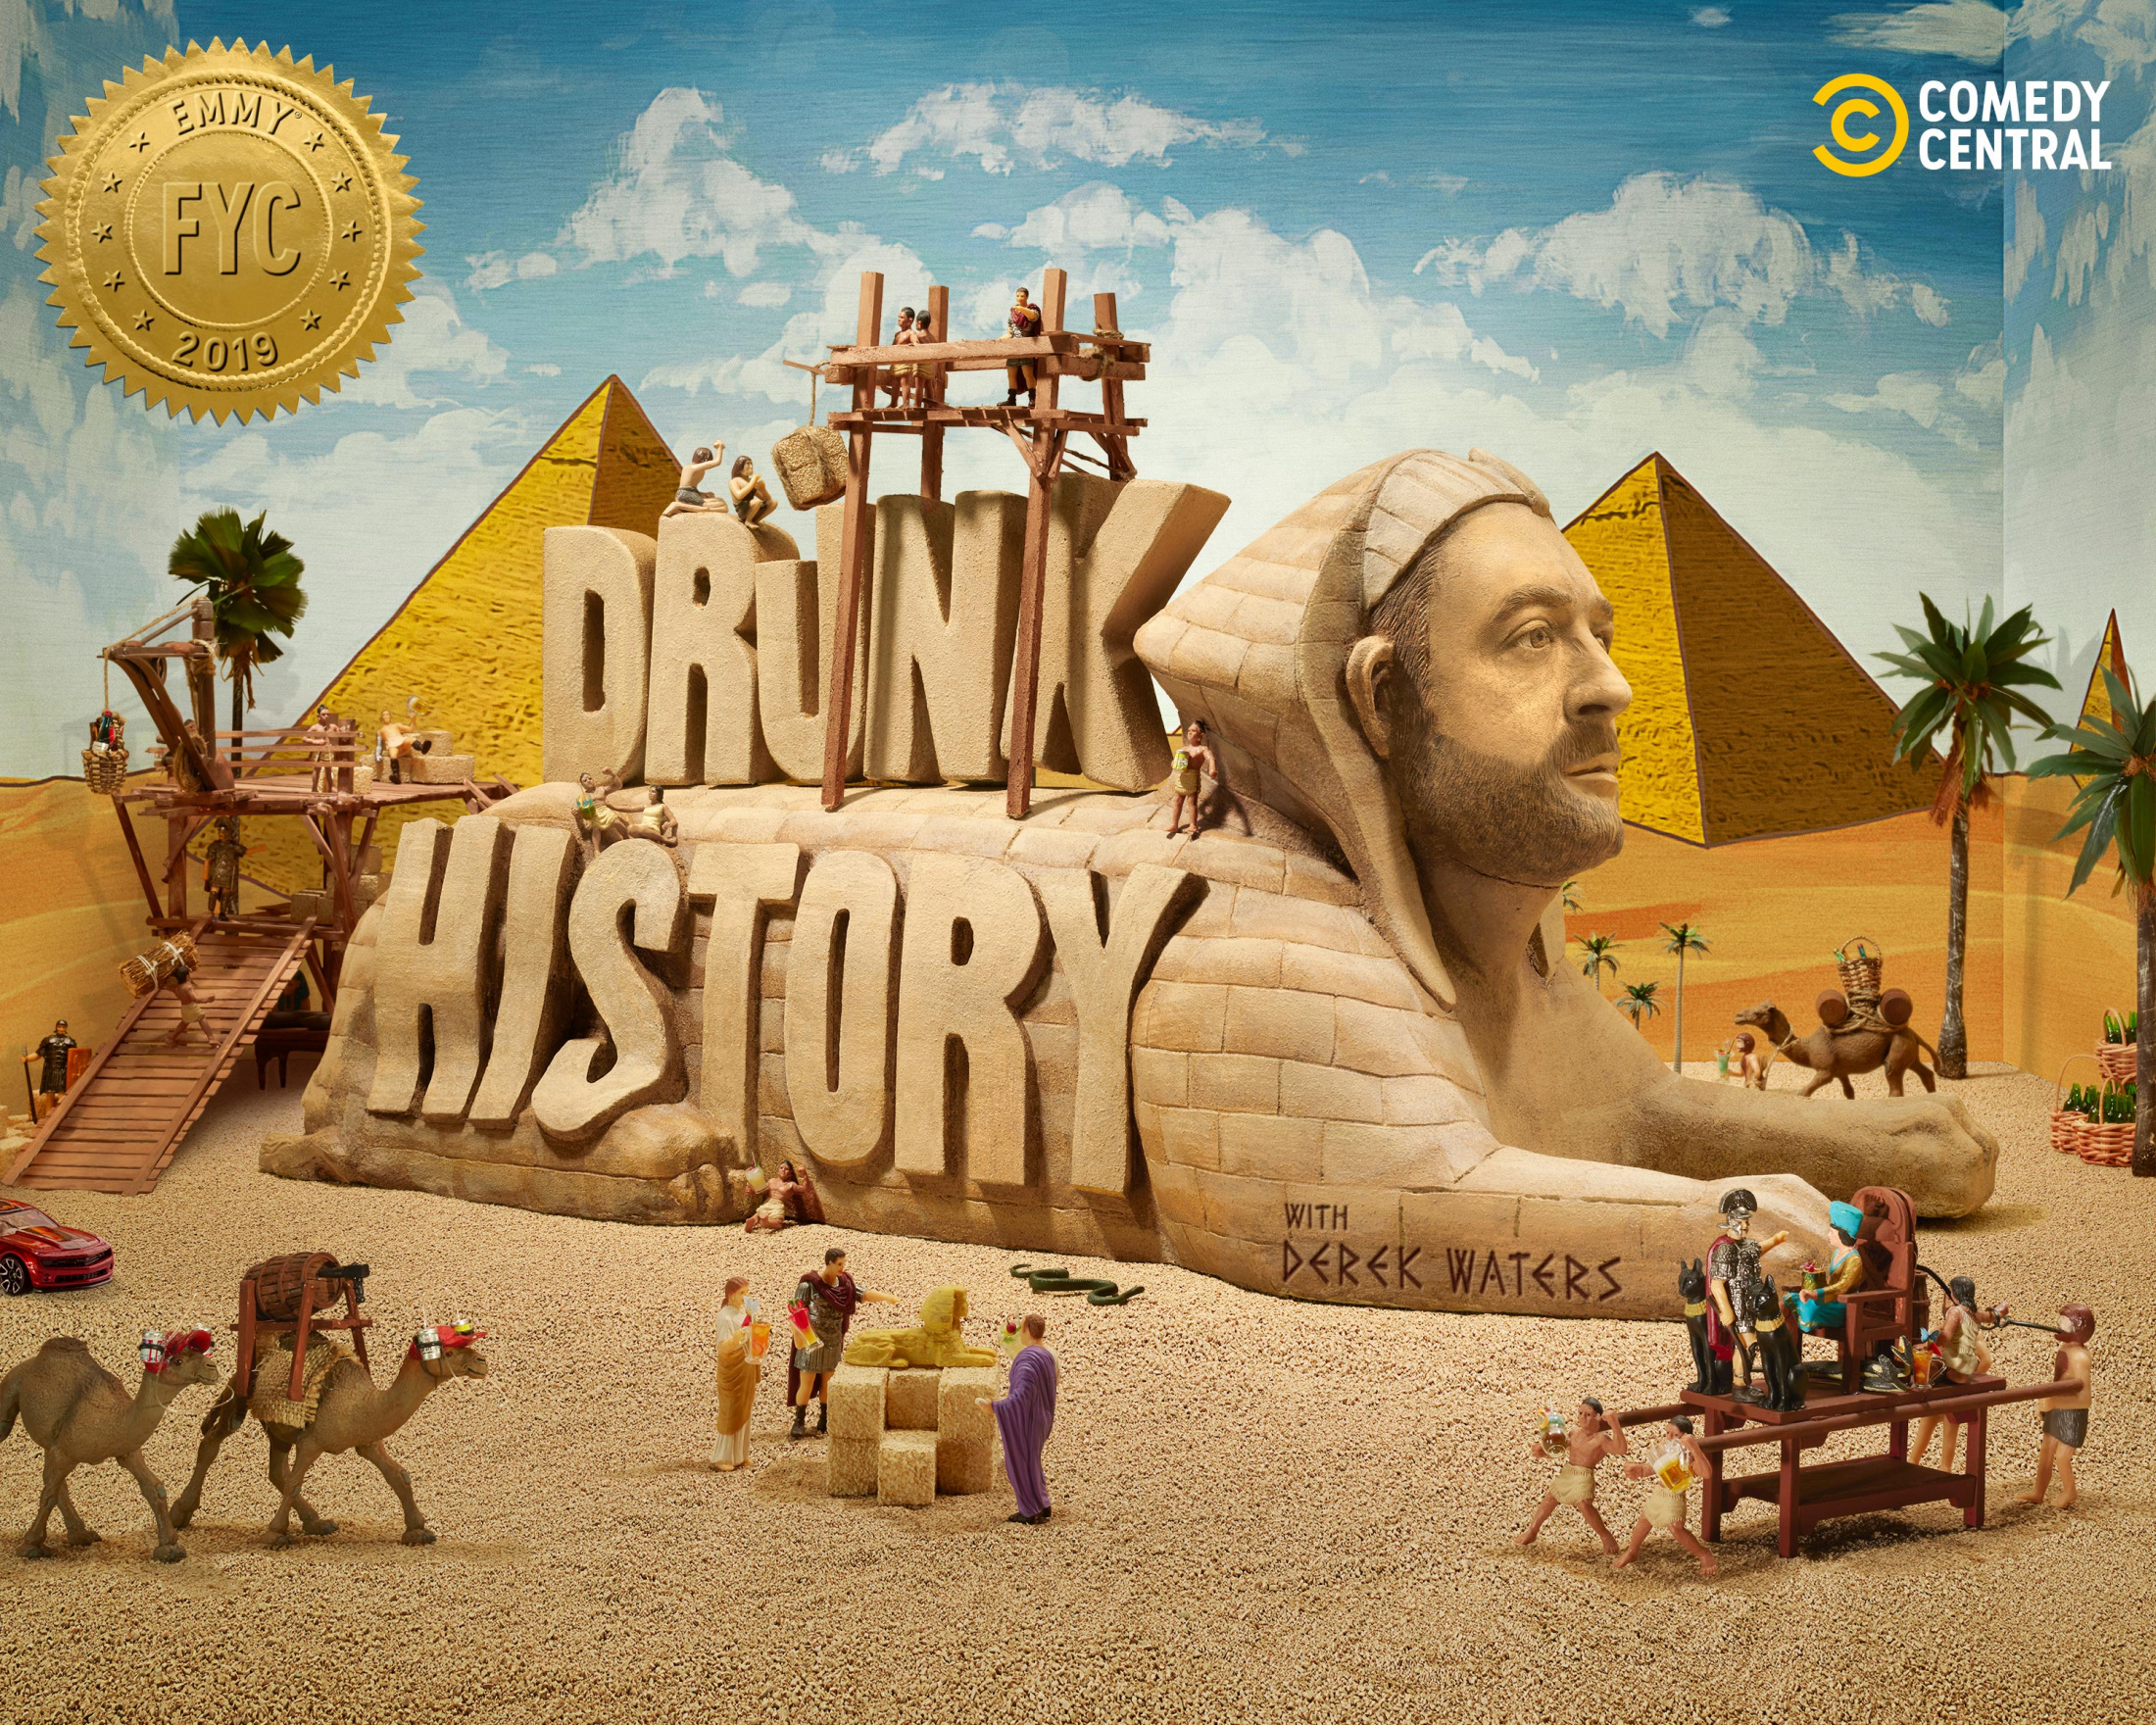 Thumbnail for Drunk History: FYC Beer Mug